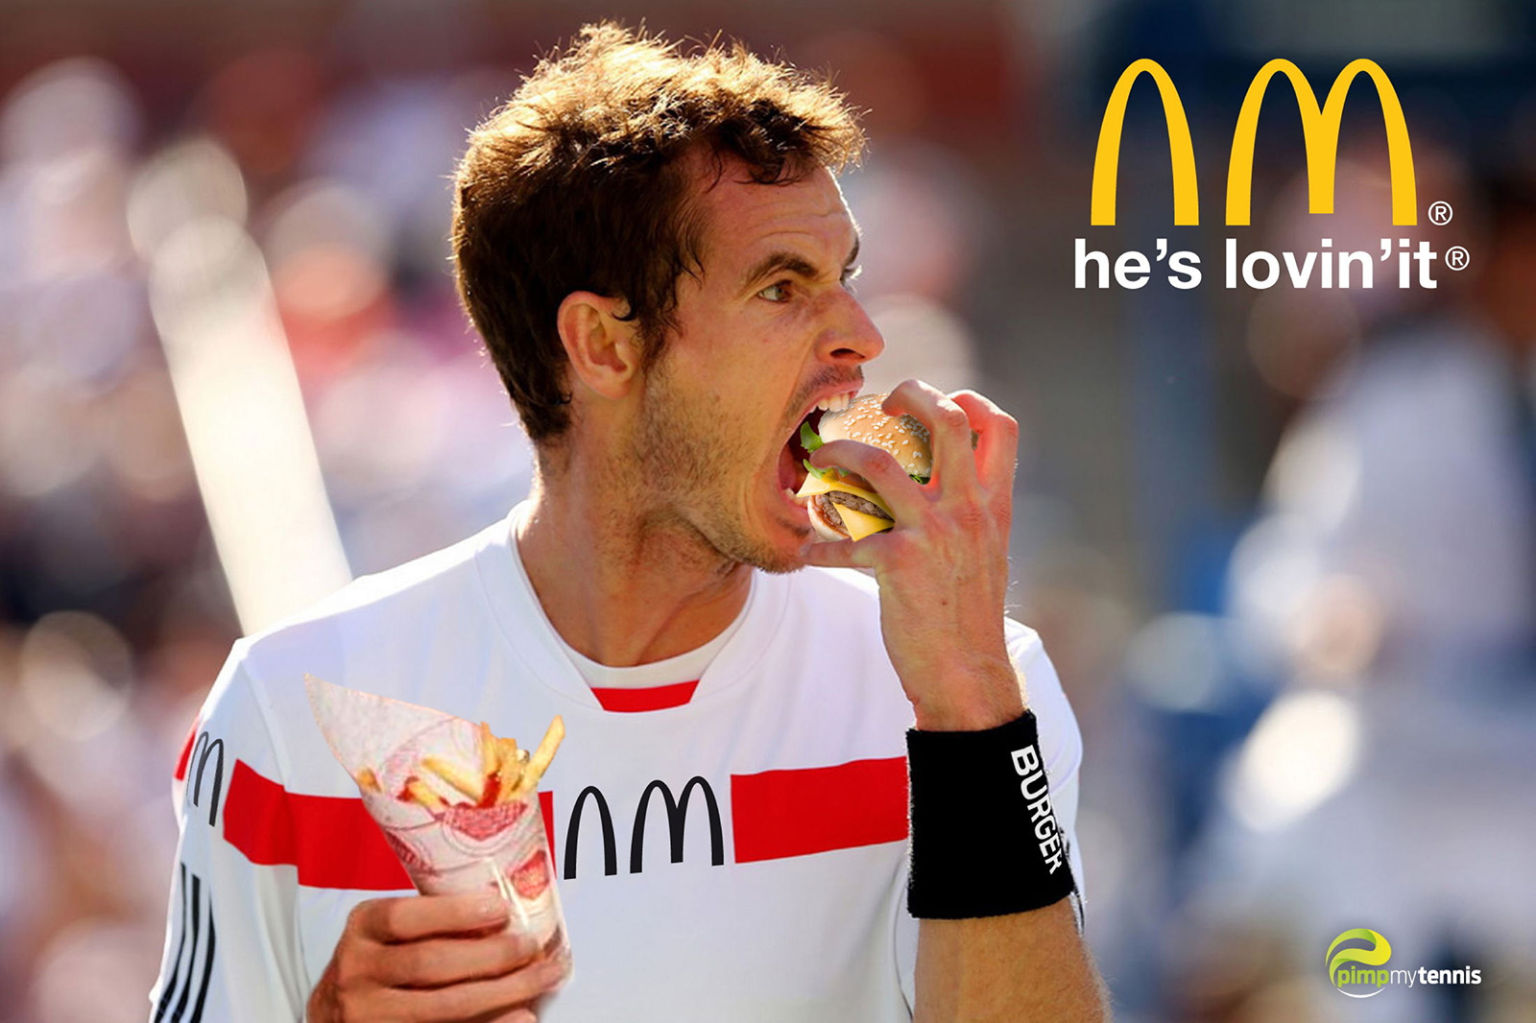 Andy.Murray_Junk.food.hamburger_M.jpg http://pimpmytennis.com/andy-murray-nourriture/